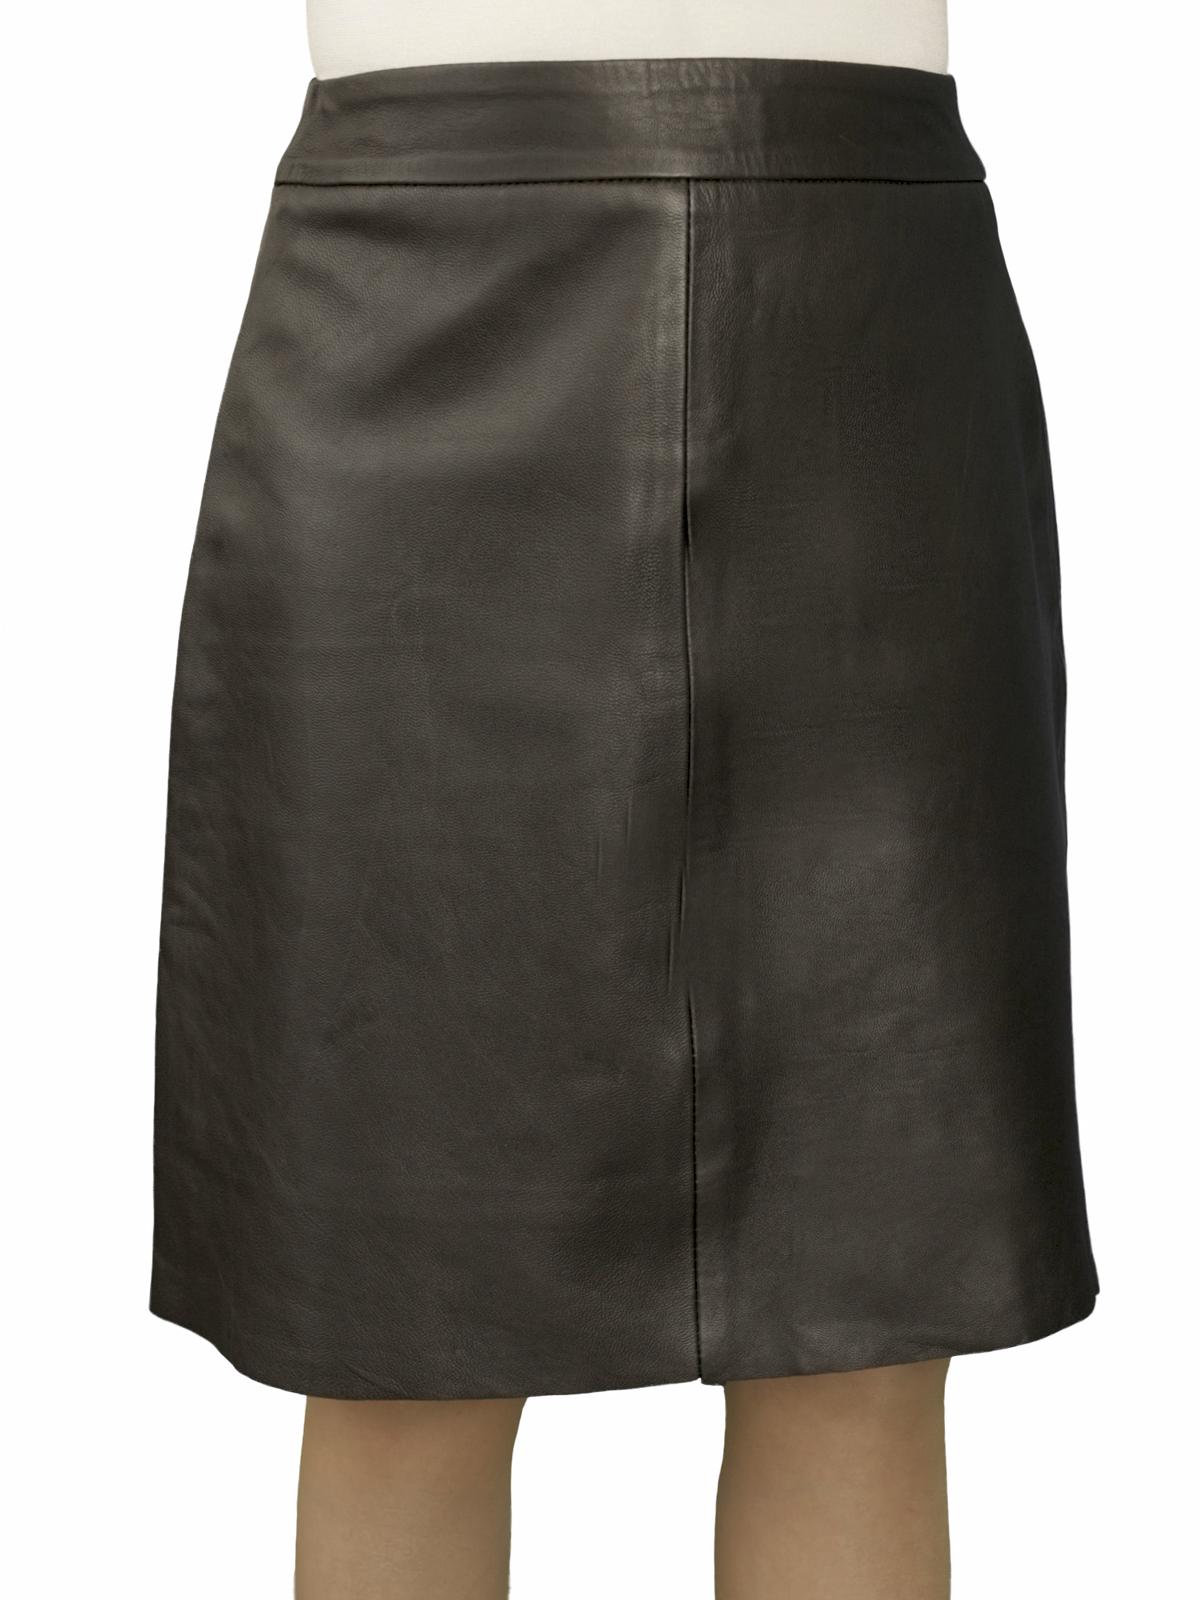 Black Leather Flared Skirt Knee Length Superior Soft (20u0026quot;) - Tout Ensemble